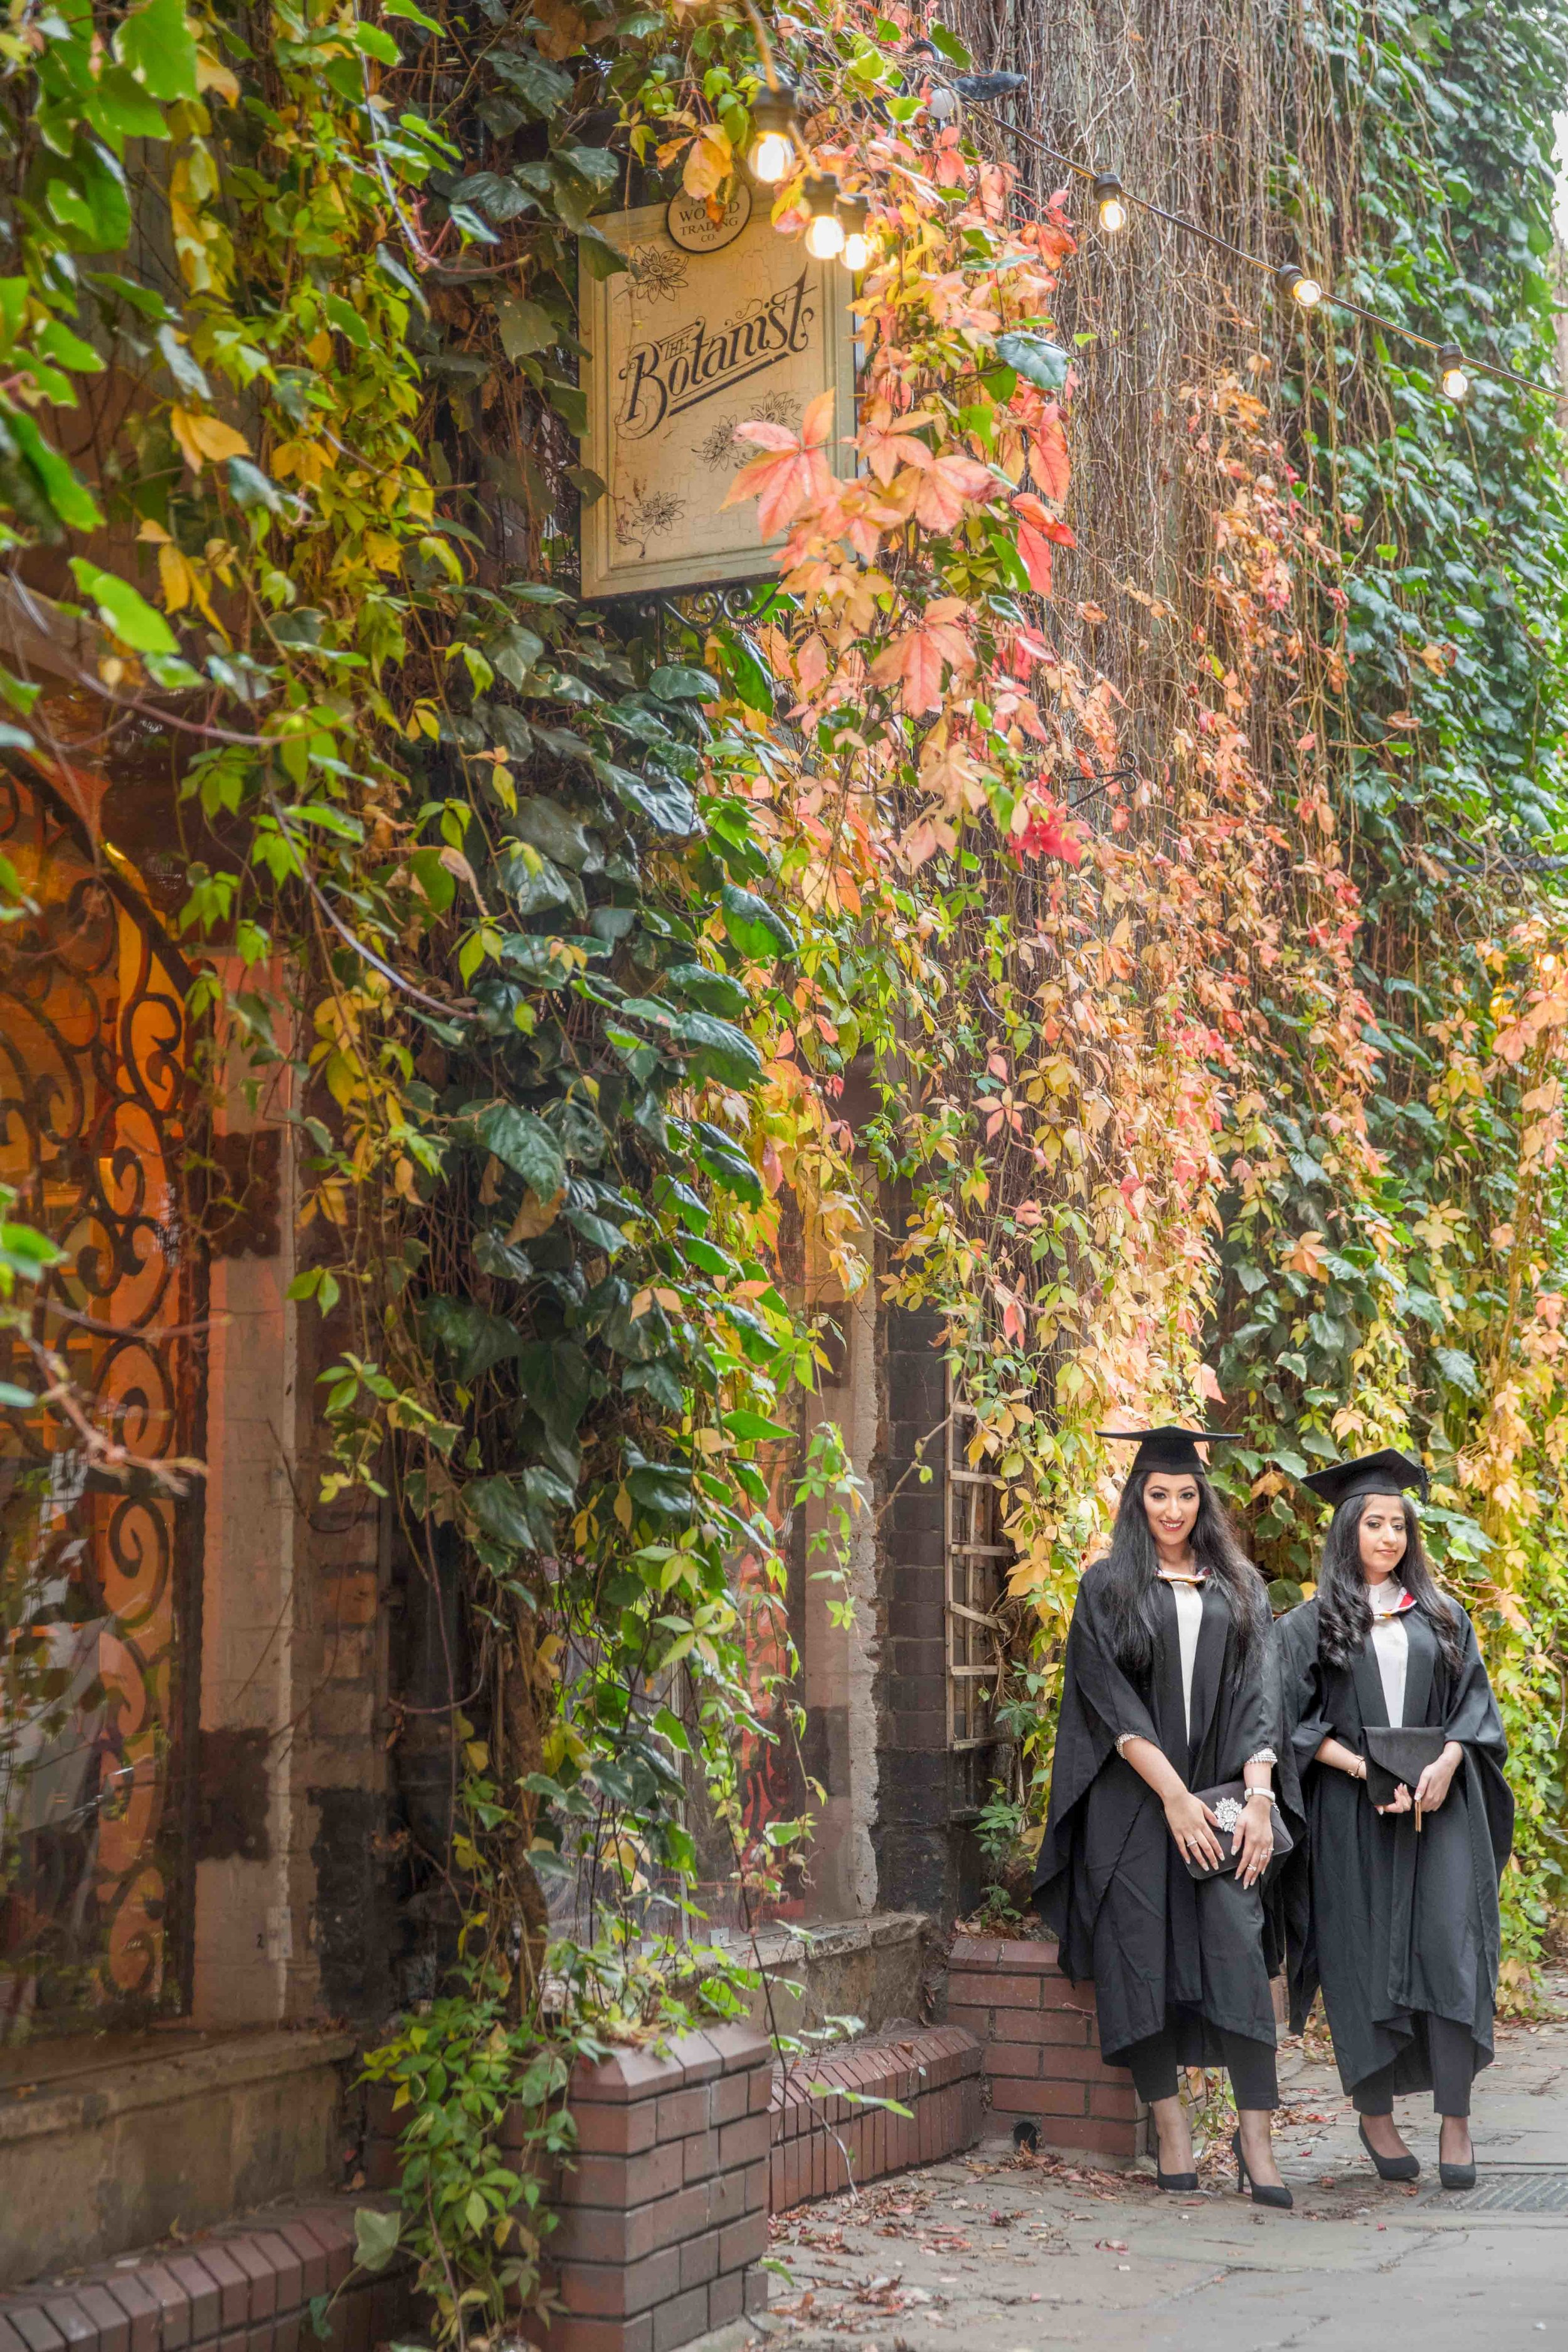 chester-university-graduation-ceremony-photography-photoshoot-graduation-photographer-Bristol-London-Cardiff-Birmingham-Chester-Natalia-smith-photography-1.jpg